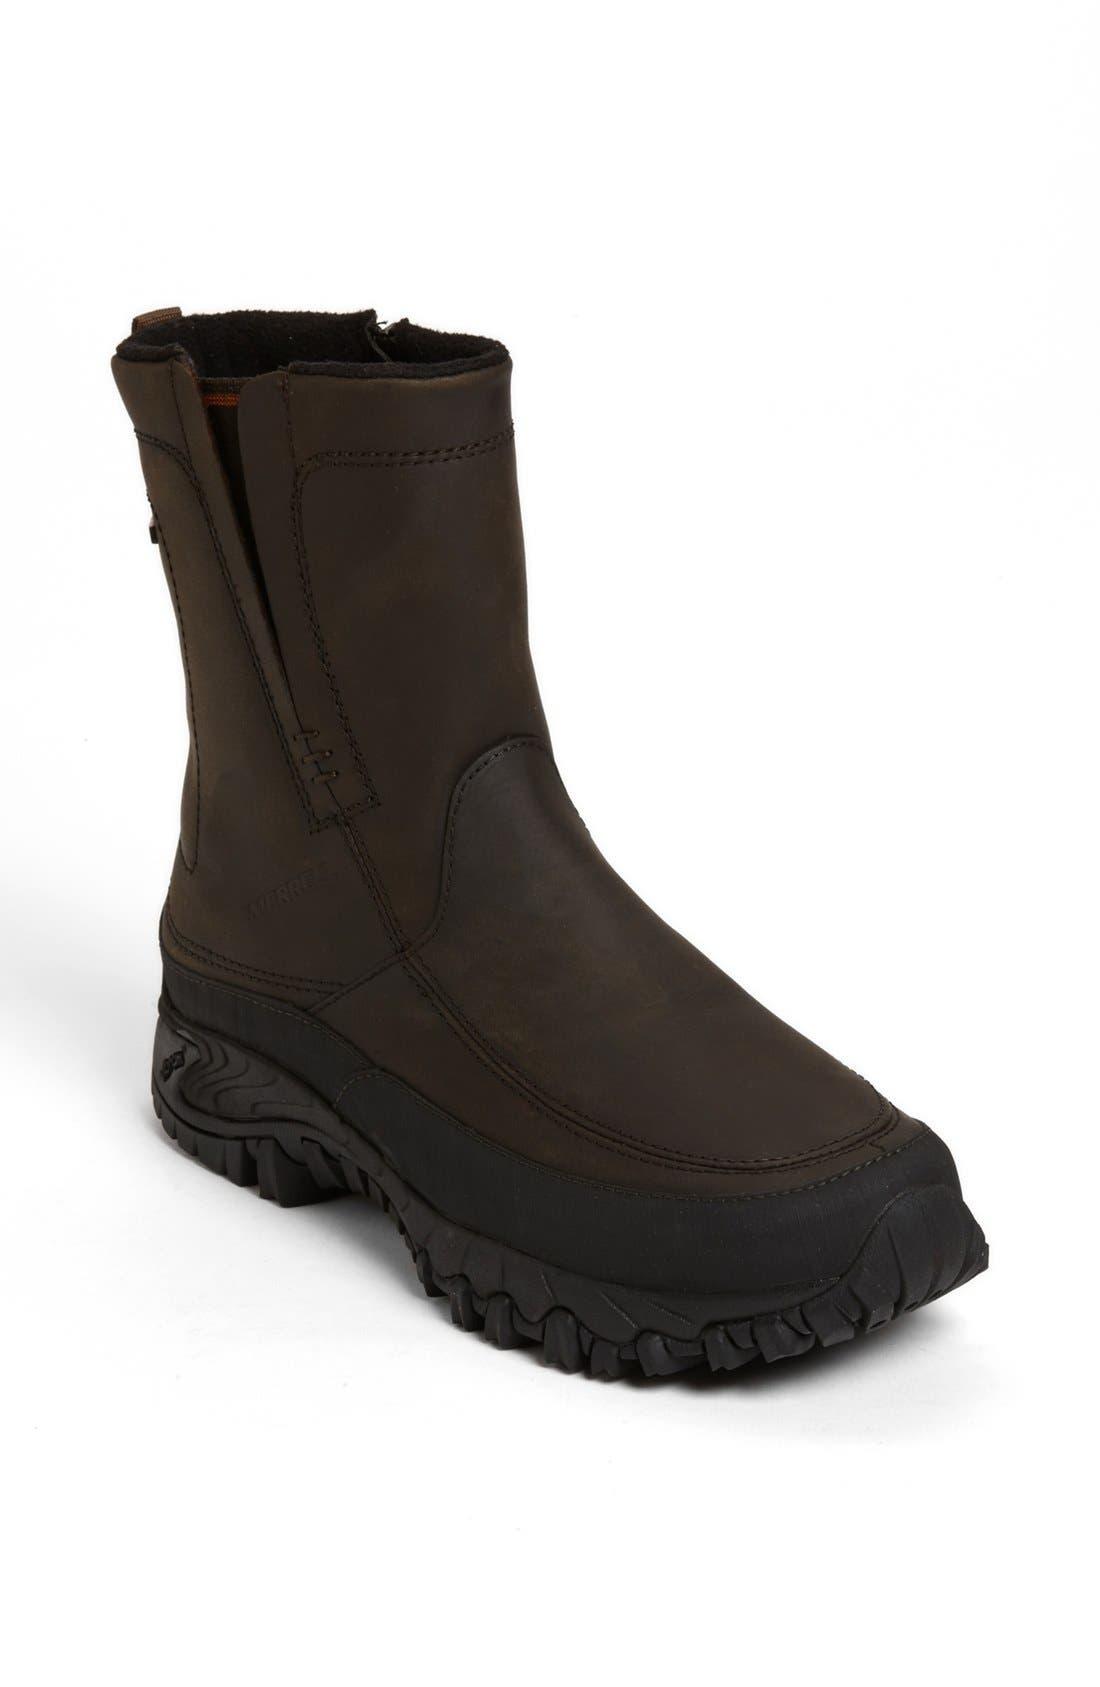 Merrell 'Shiver' Waterproof Boot